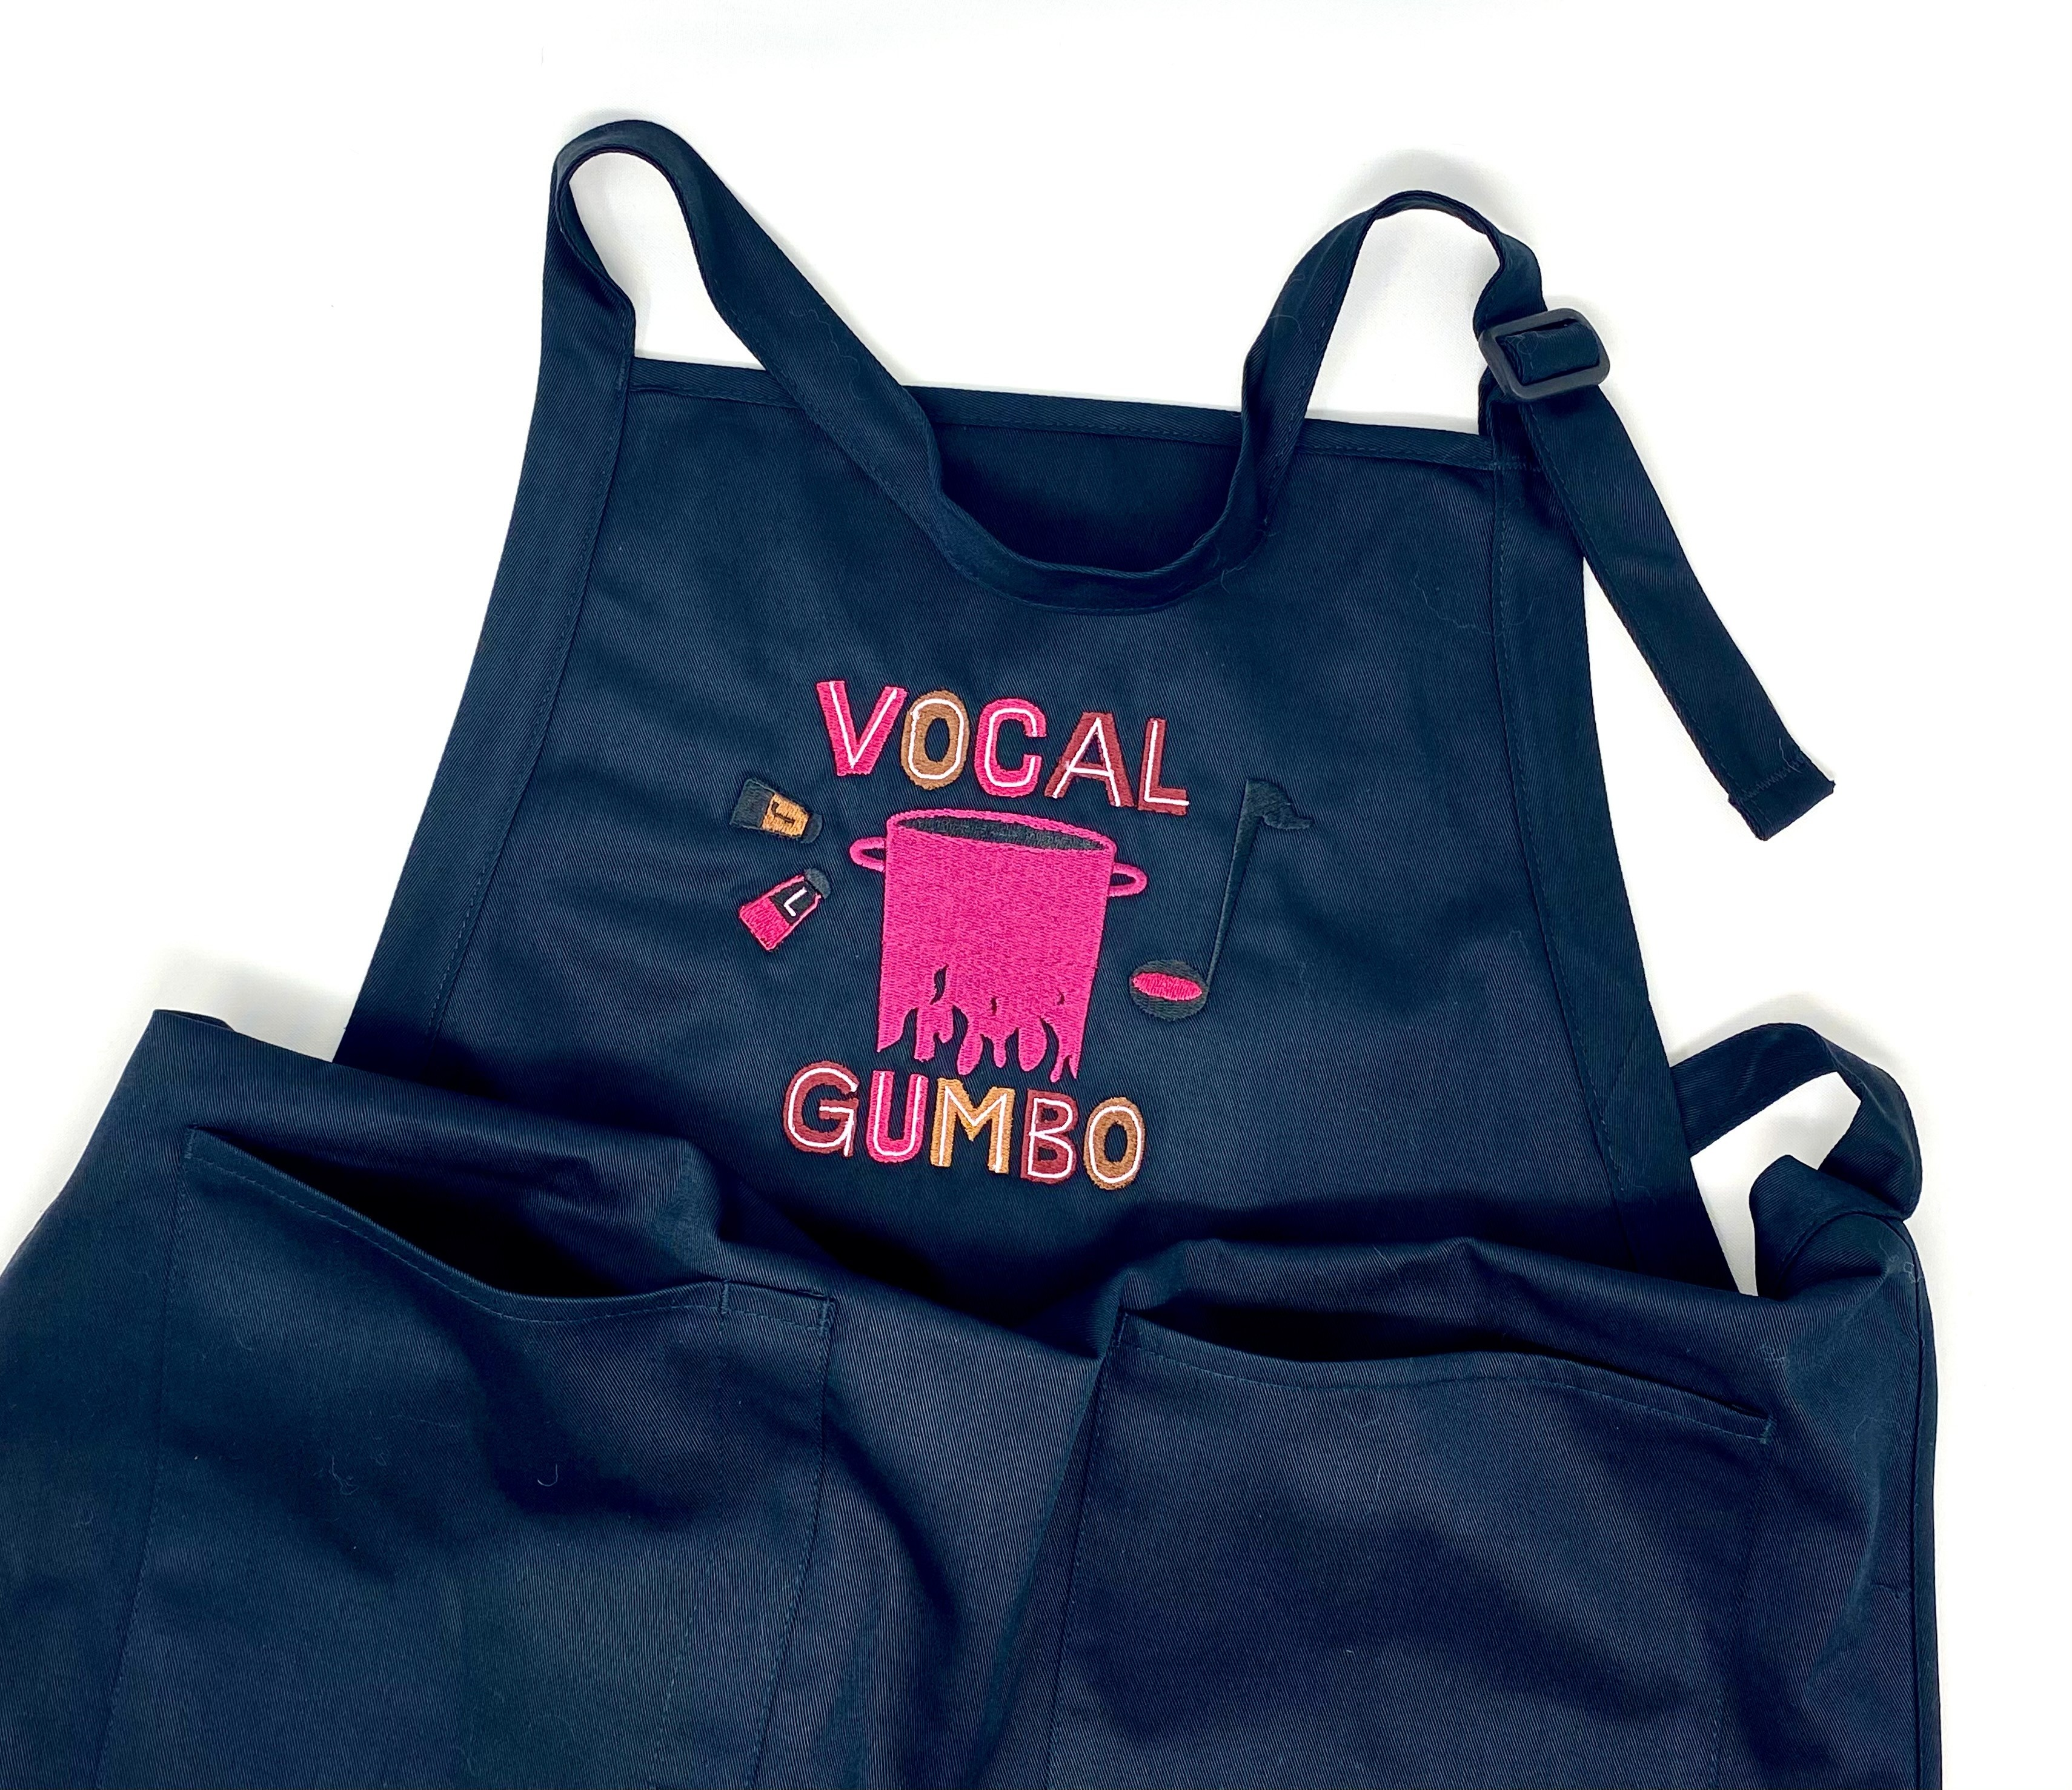 VOCAL GUMBO Apron